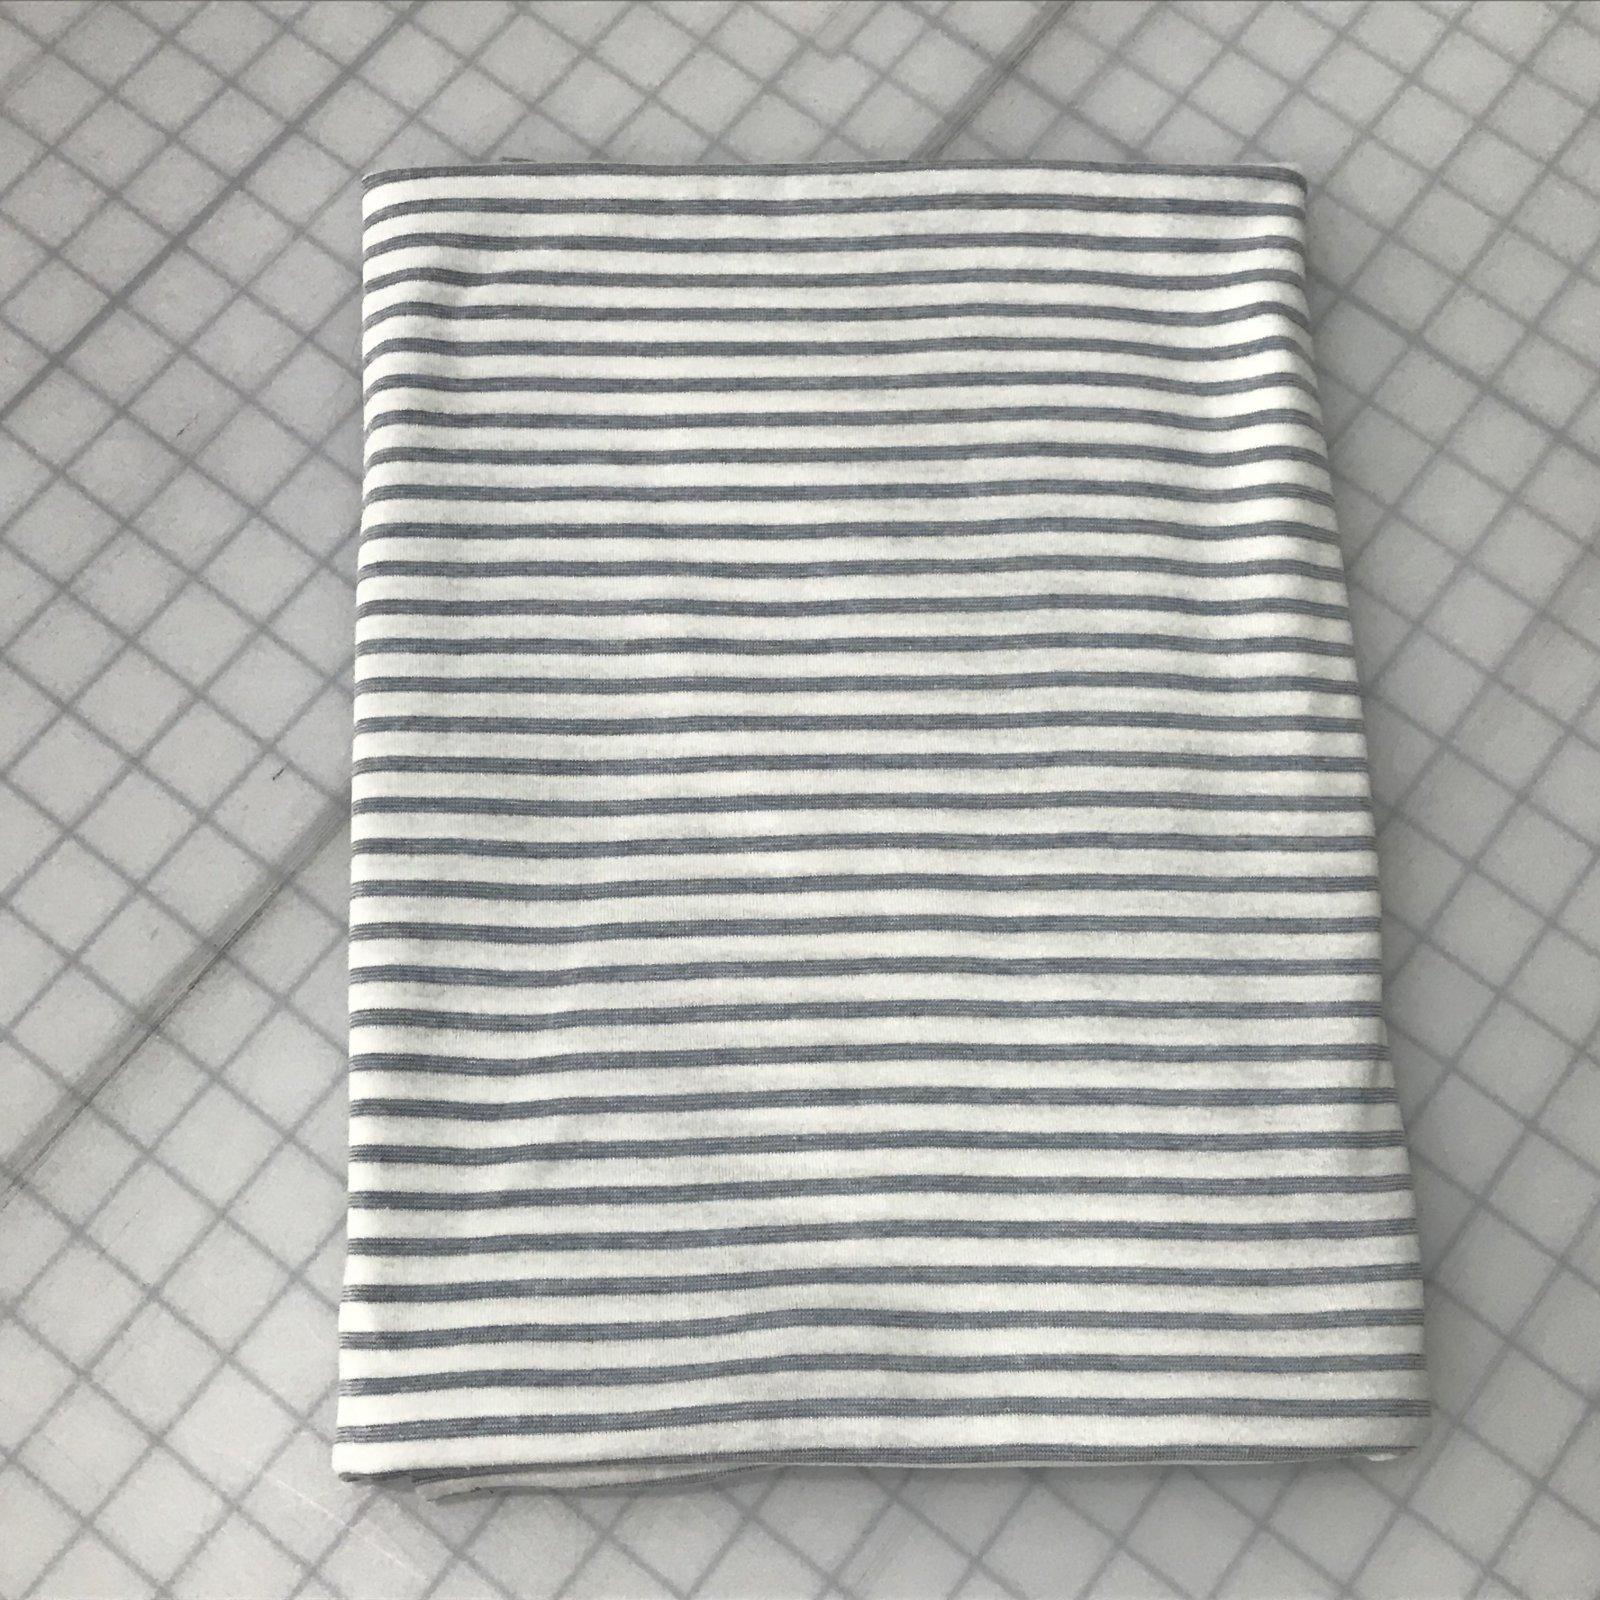 Cotton Knit - Denim & White Stripe - 1 1/2 yards